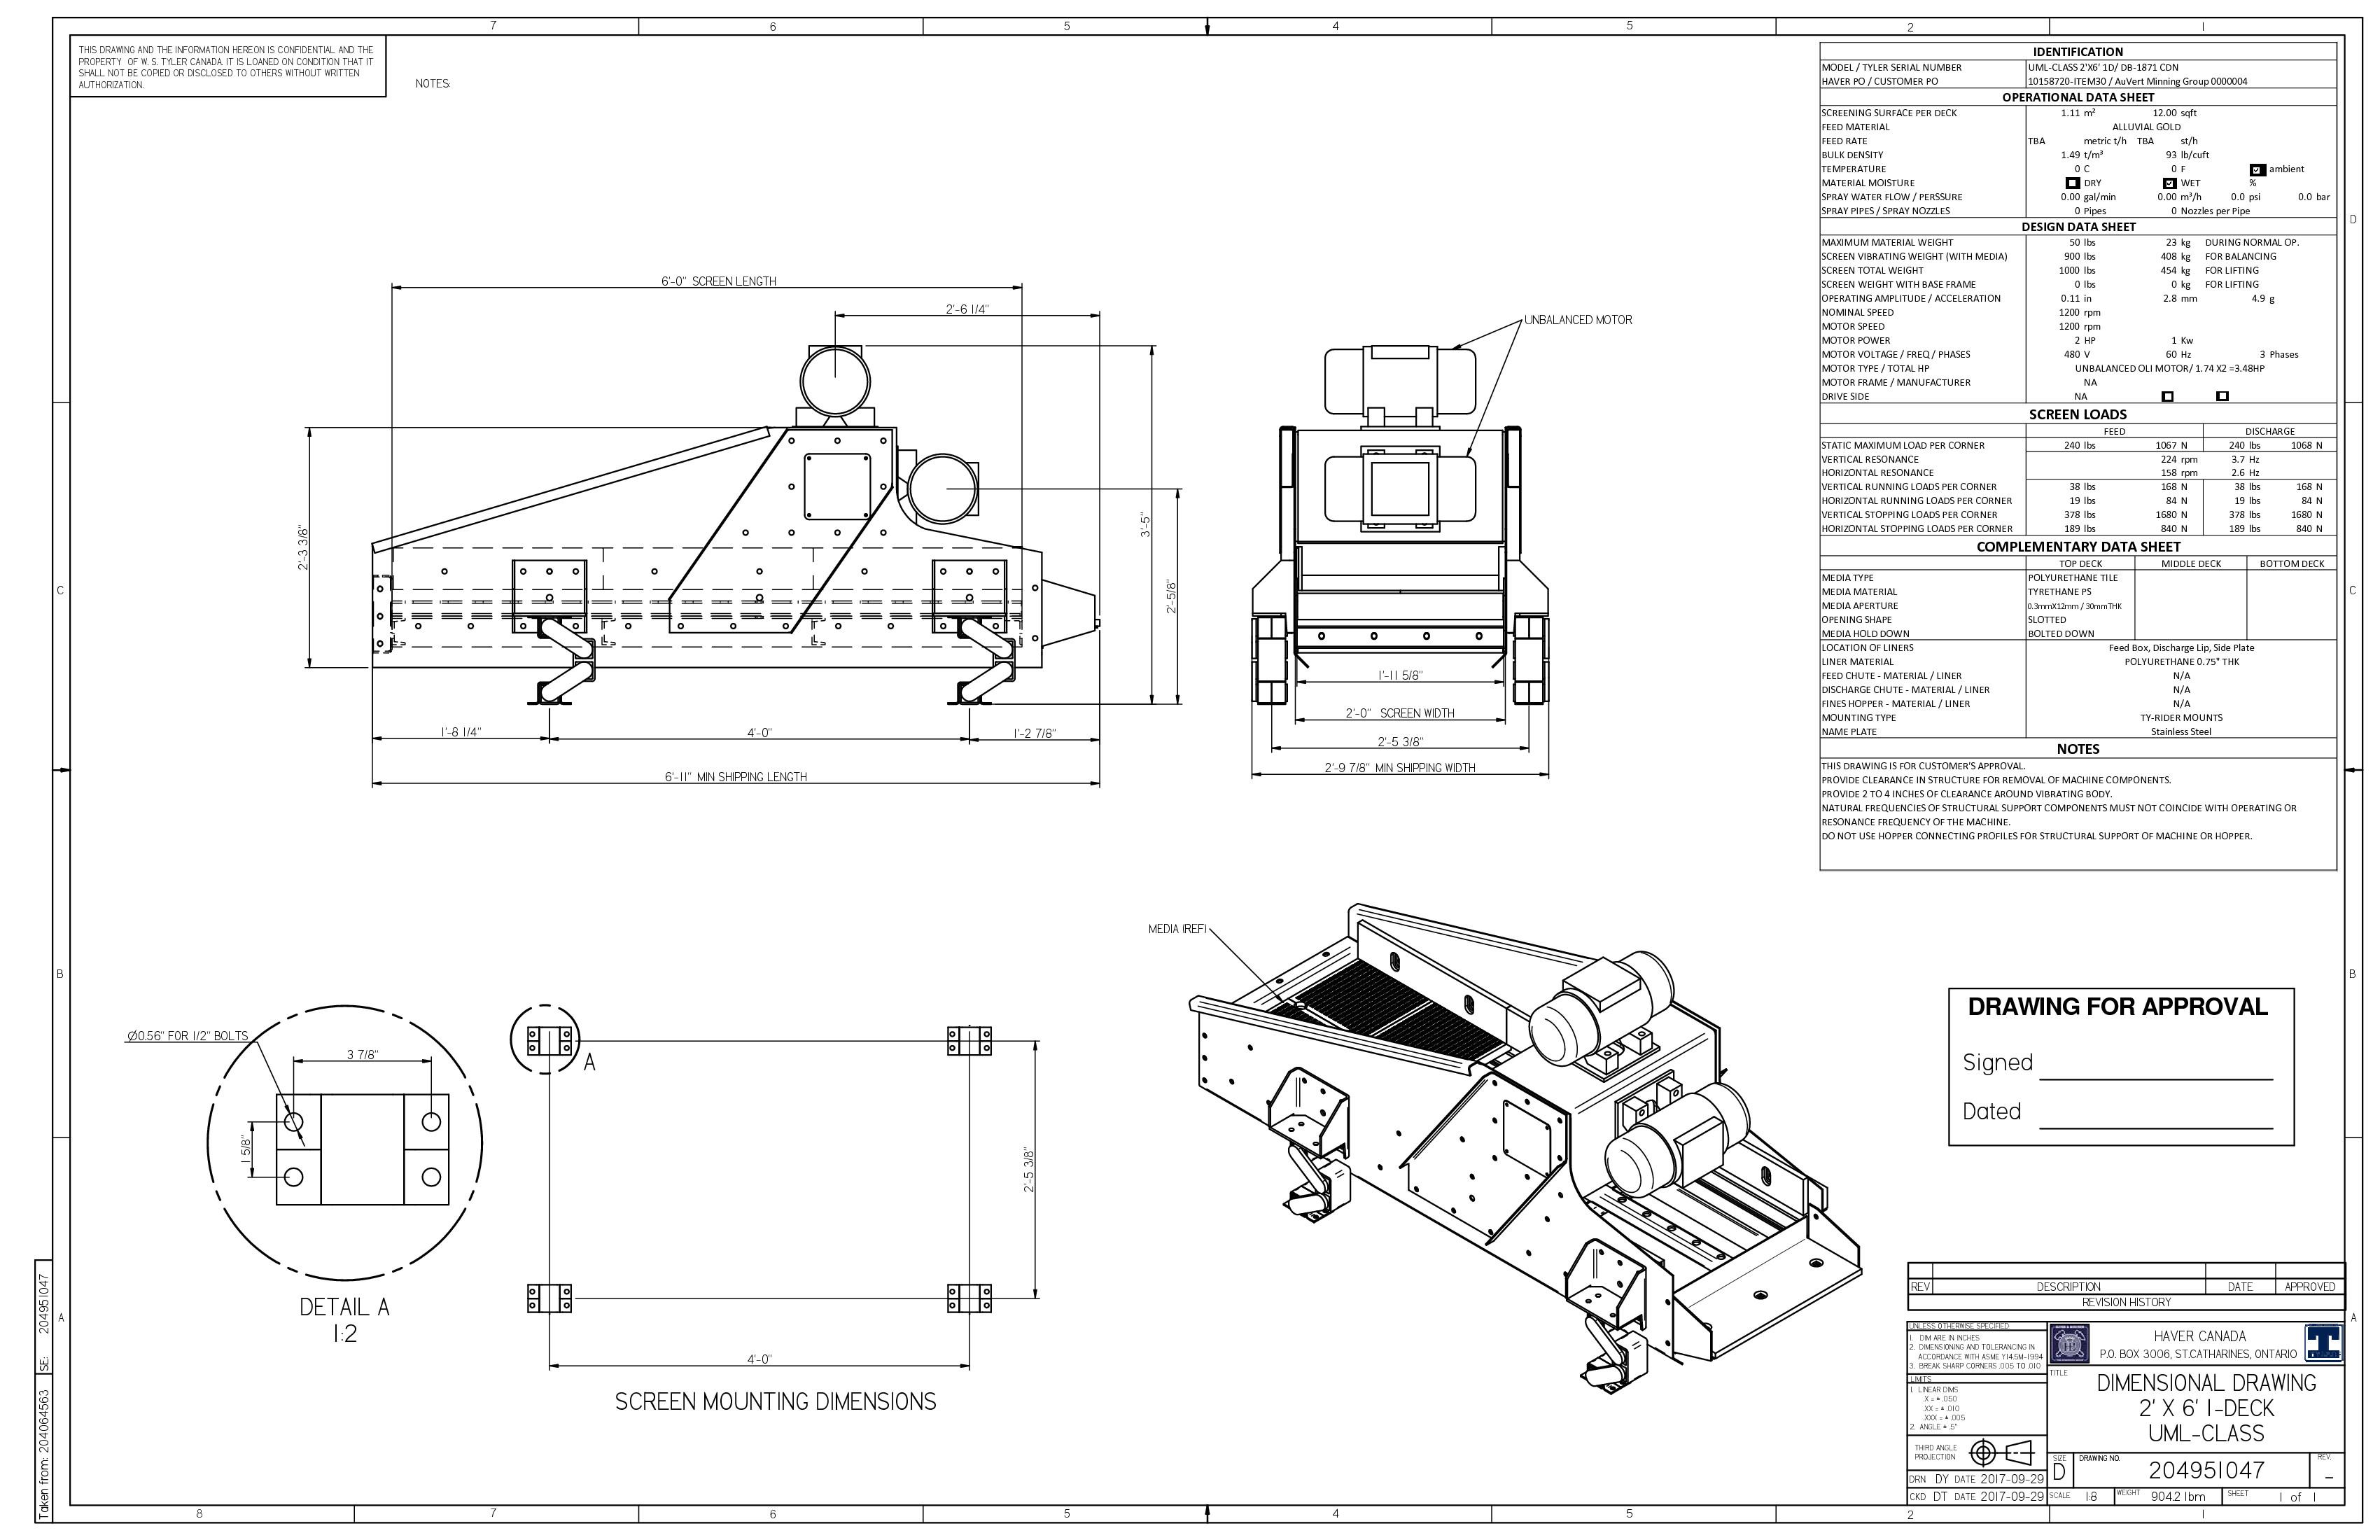 UML-Class 2' x 6' Deck Horizontal Vibrating Screen